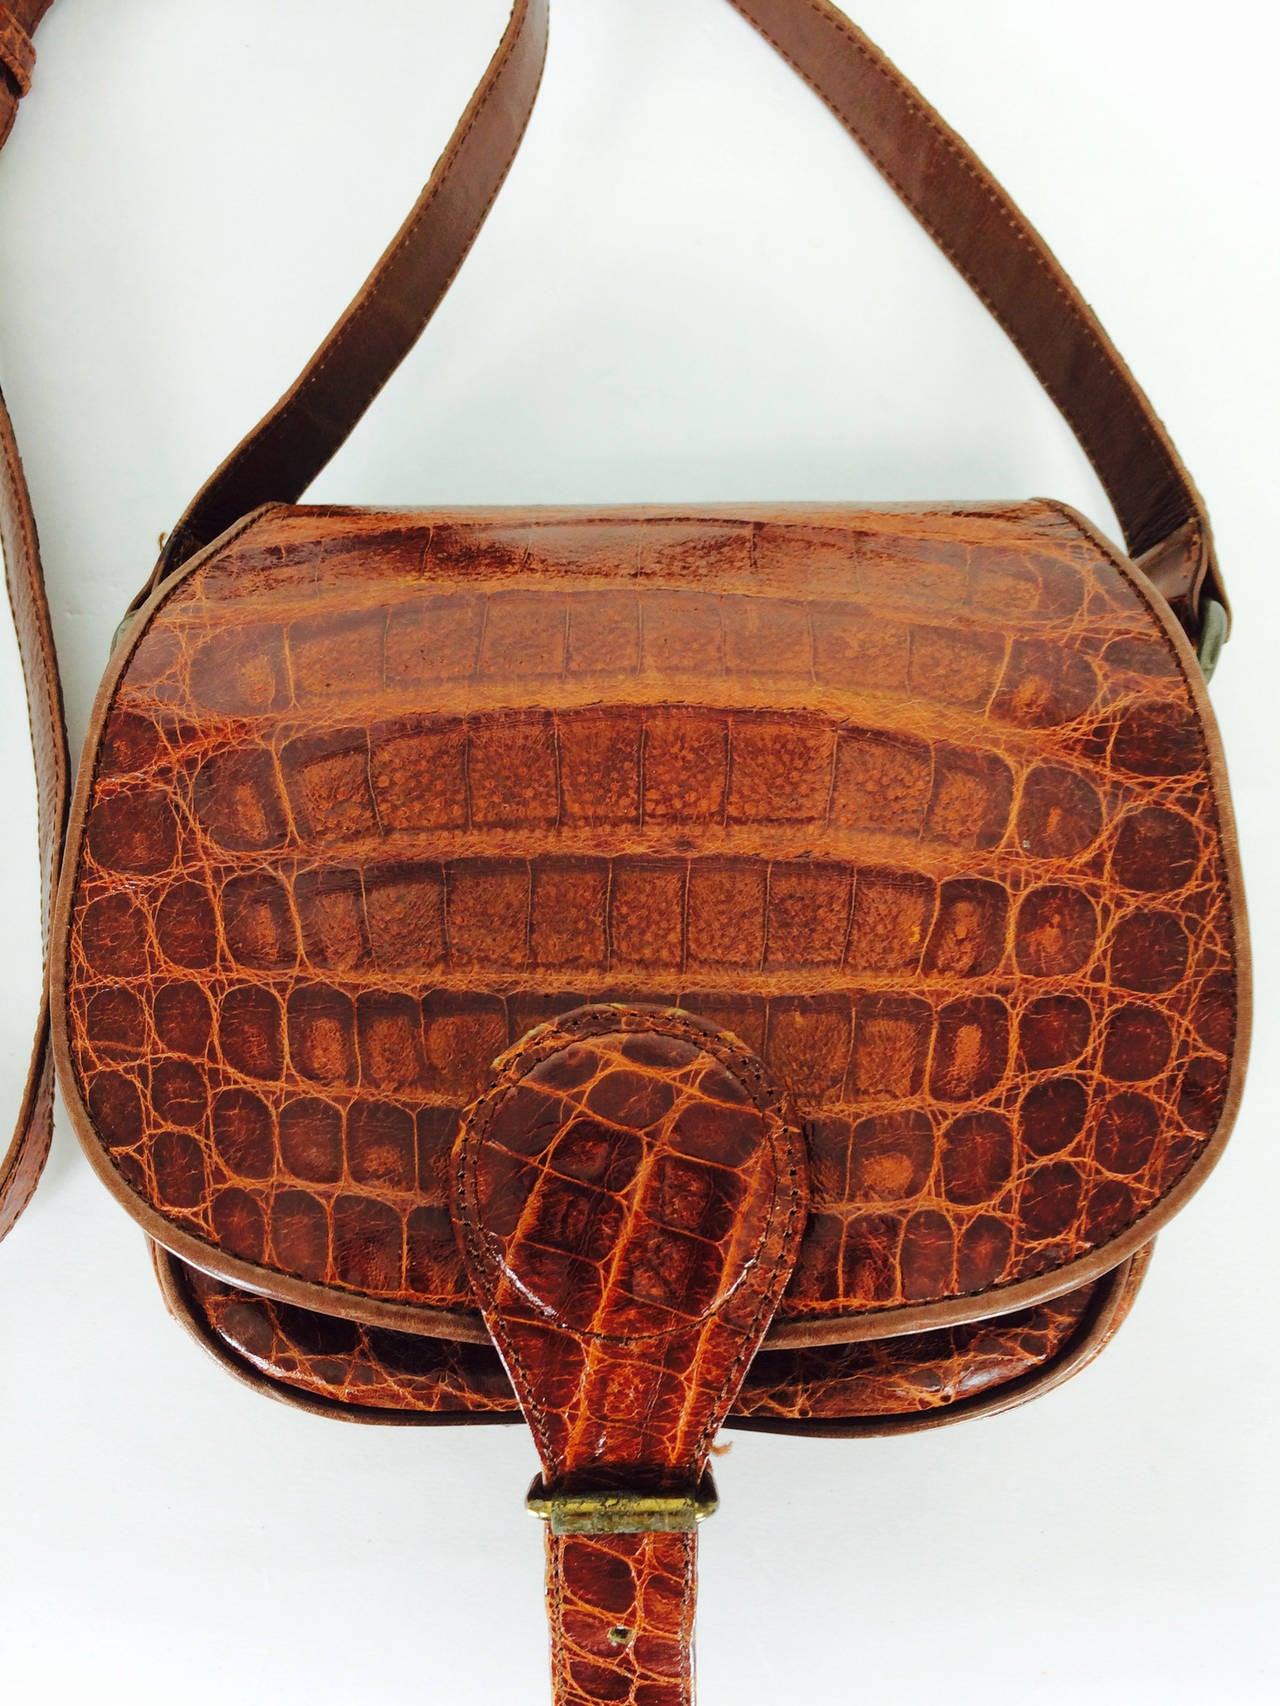 Saddle bag handbag cognac leather faux alligator Neiman Marcus 1980s 2